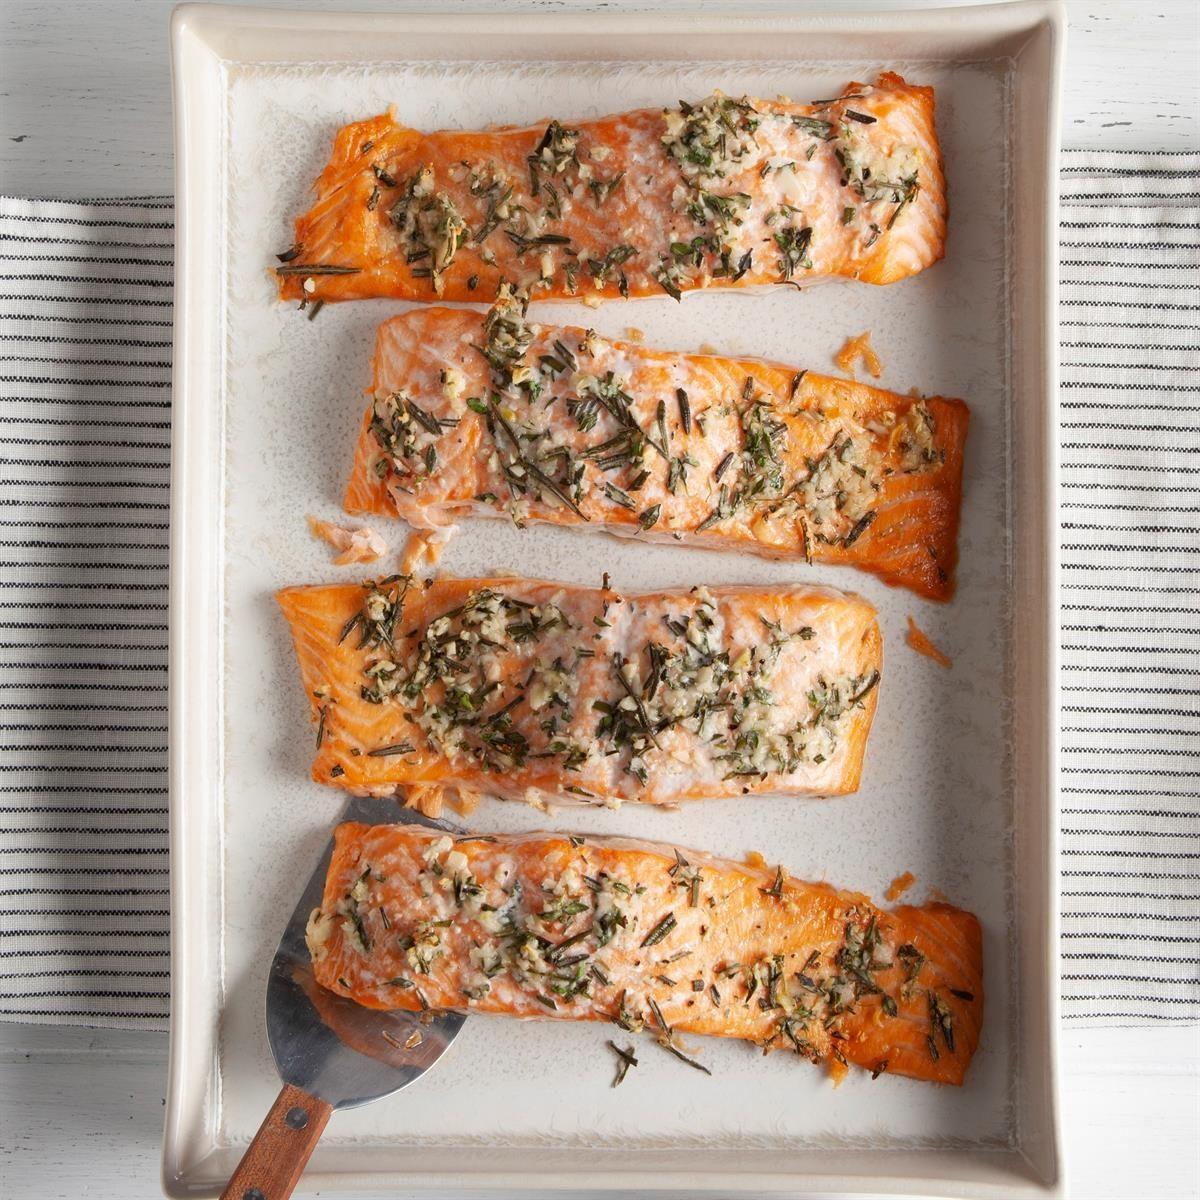 Herb Roasted Salmon Fillets Exps Ft20 164150 F 0812 1 1